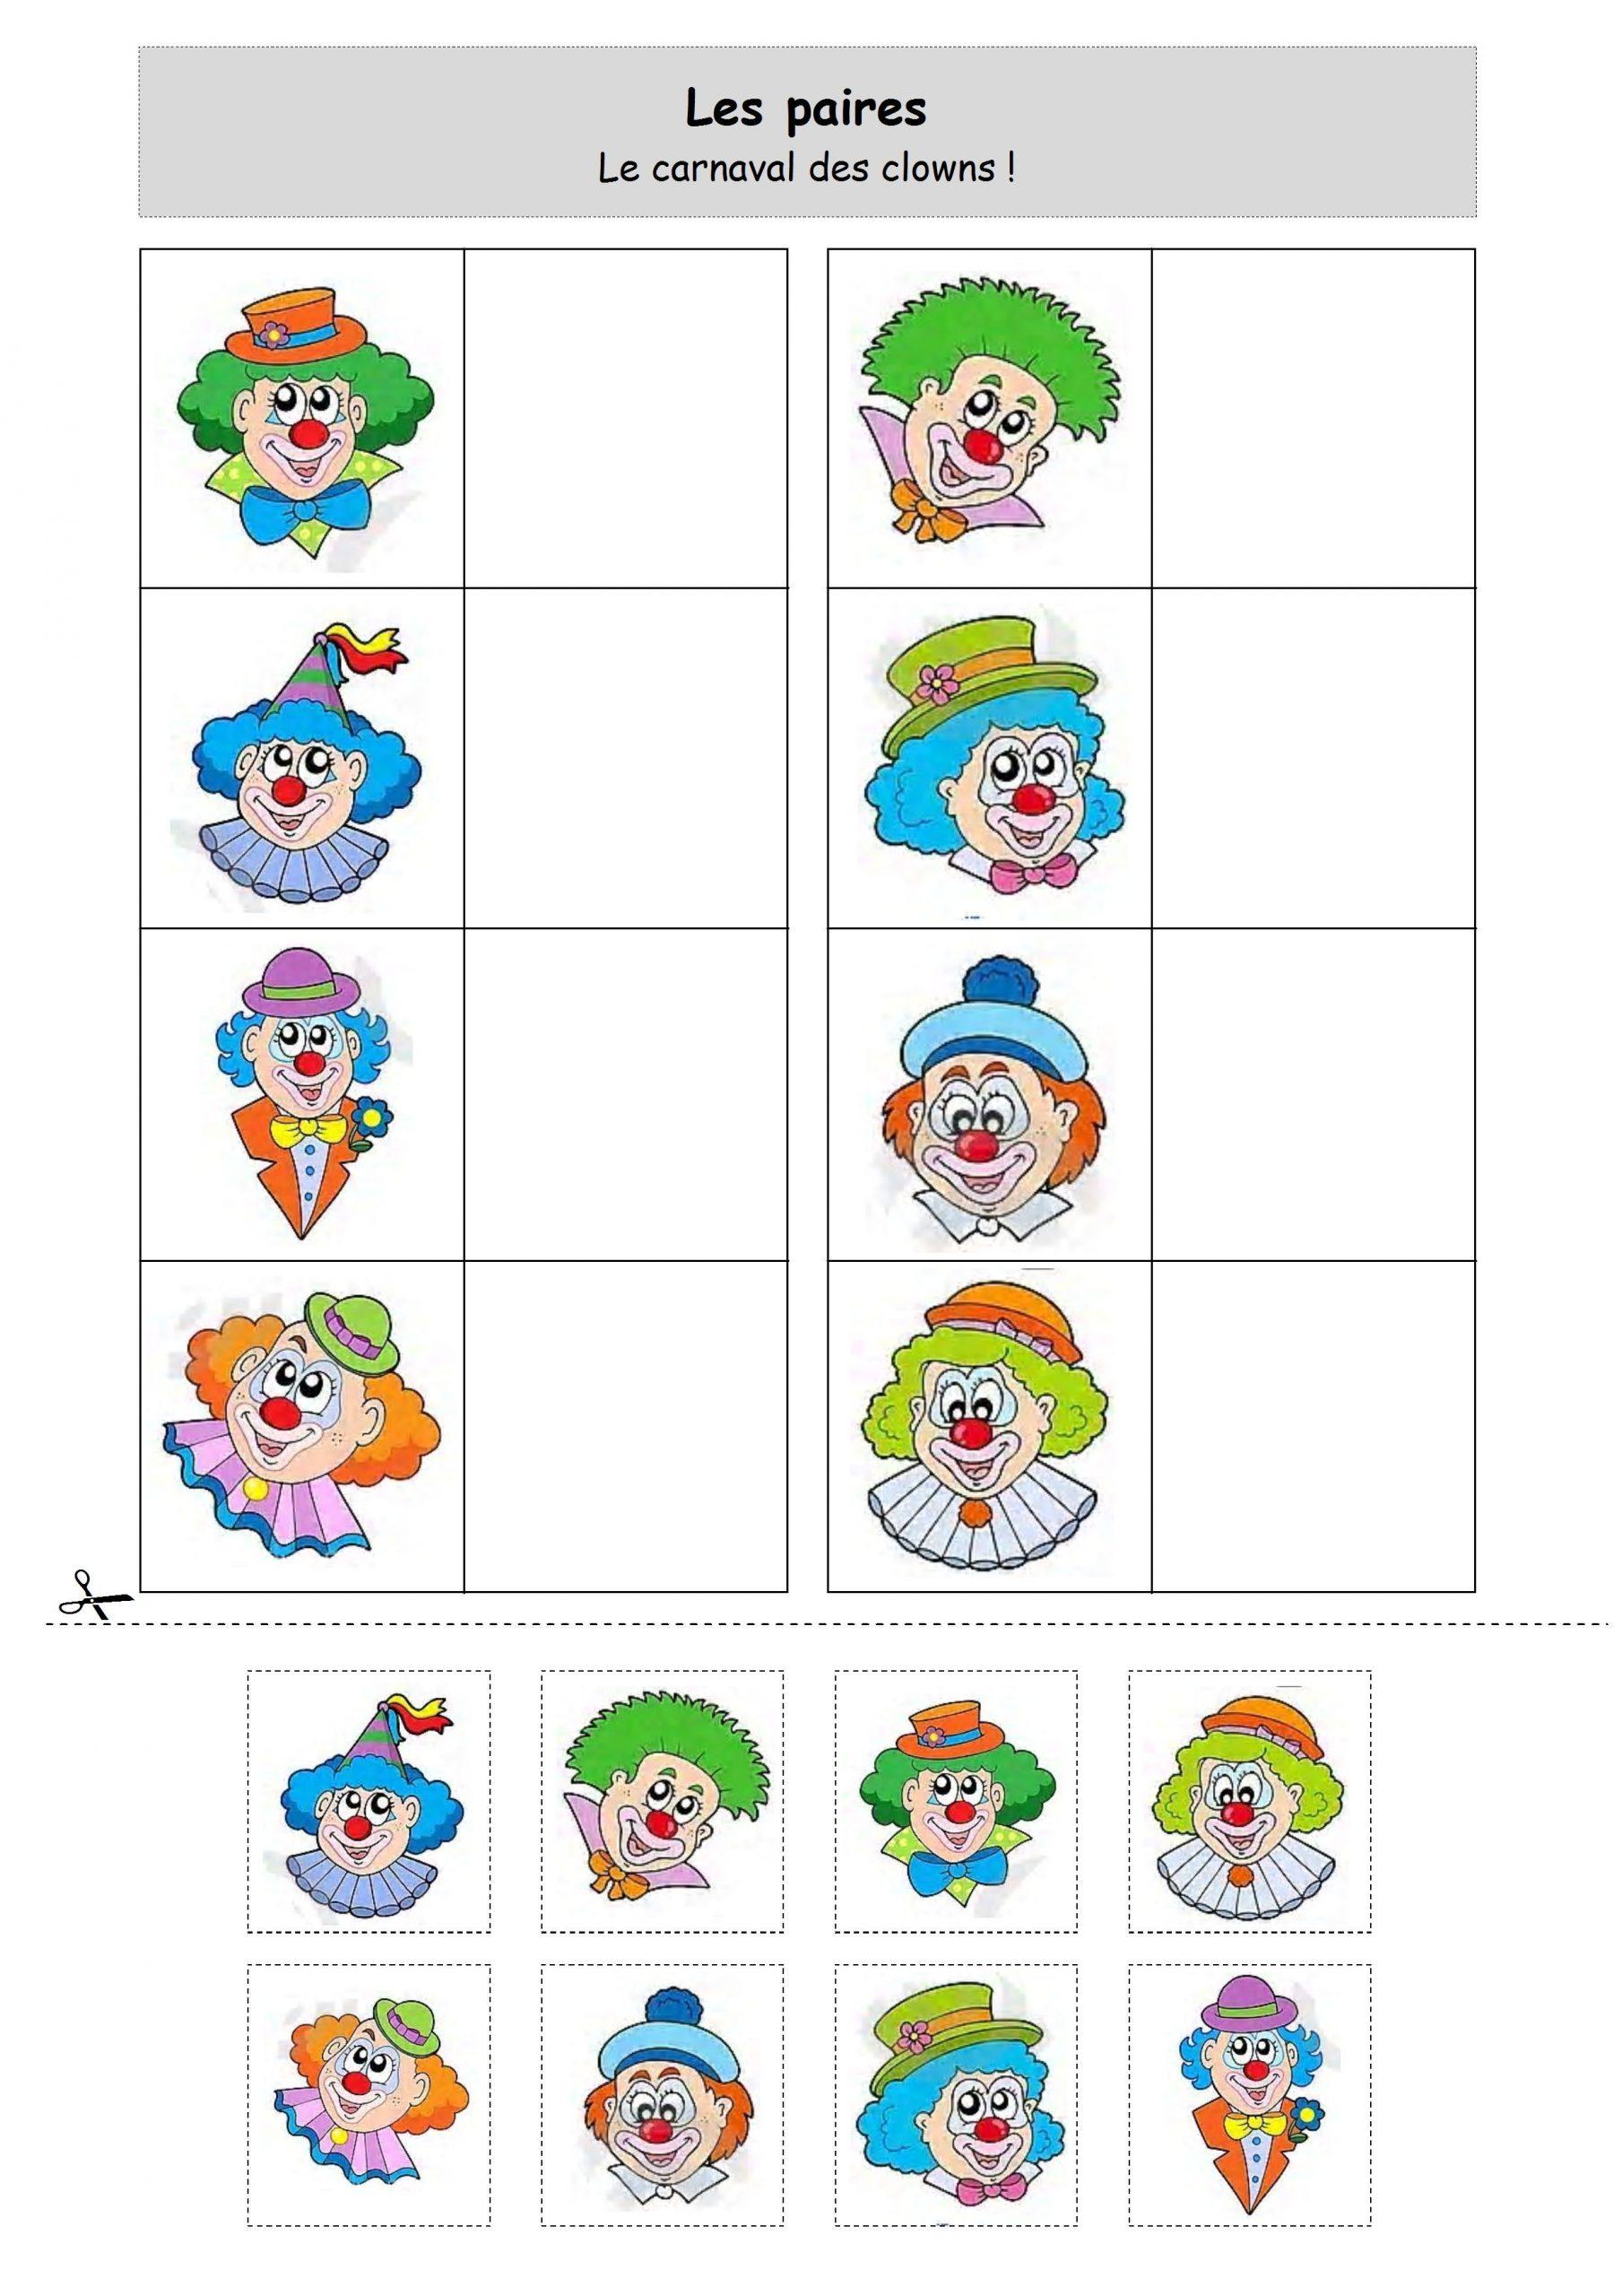 Loto Clown | Carnaval Maternelle, Carnaval, Activité Carnaval destiné Theme Carnaval Maternelle